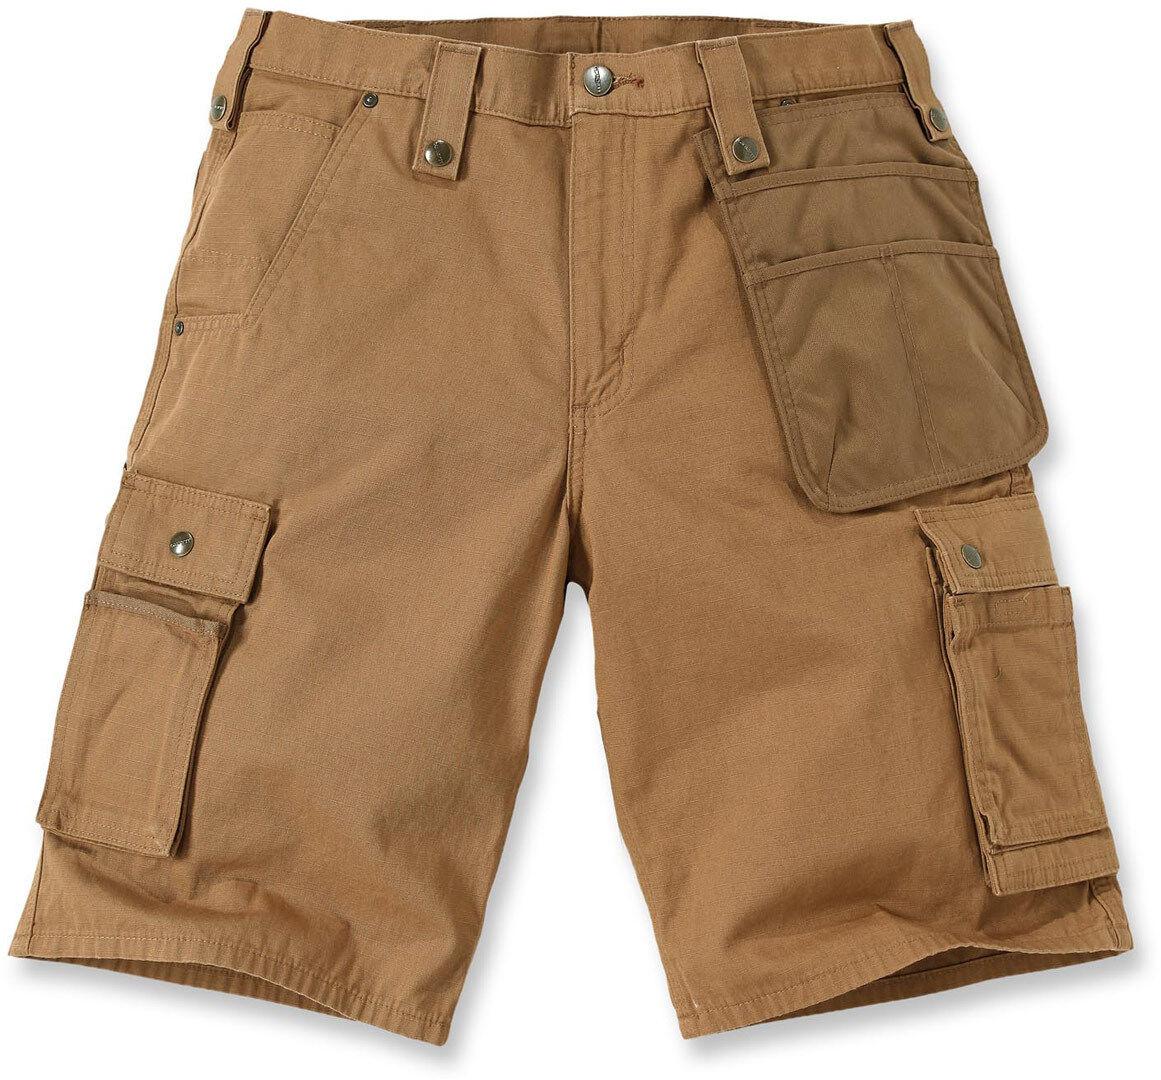 Carhartt Multi Pocket Ripstop Pantalones cortos Marrón 30